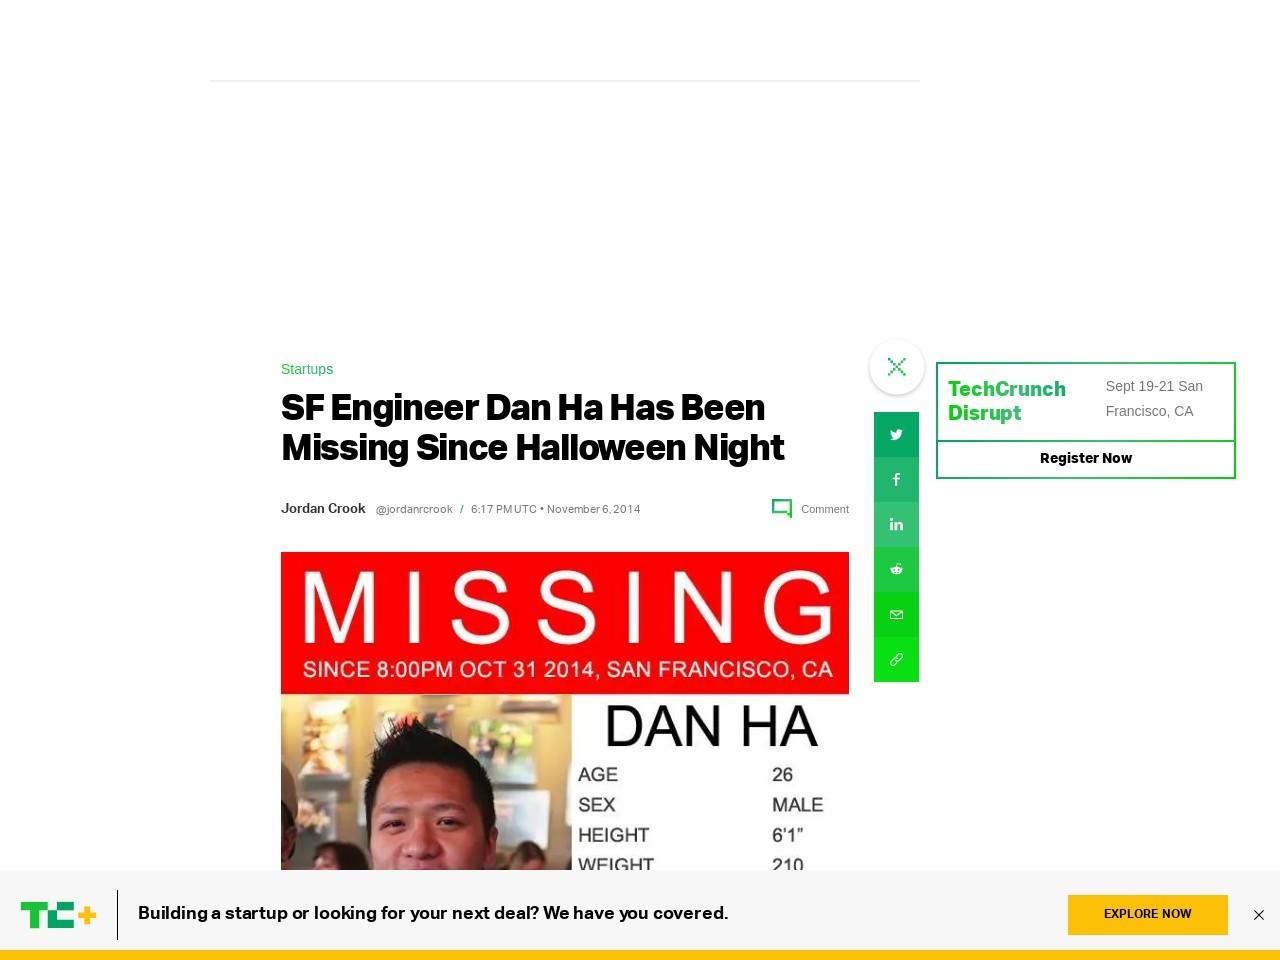 SF Engineer Dan Ha Has Been Missing Since Halloween …